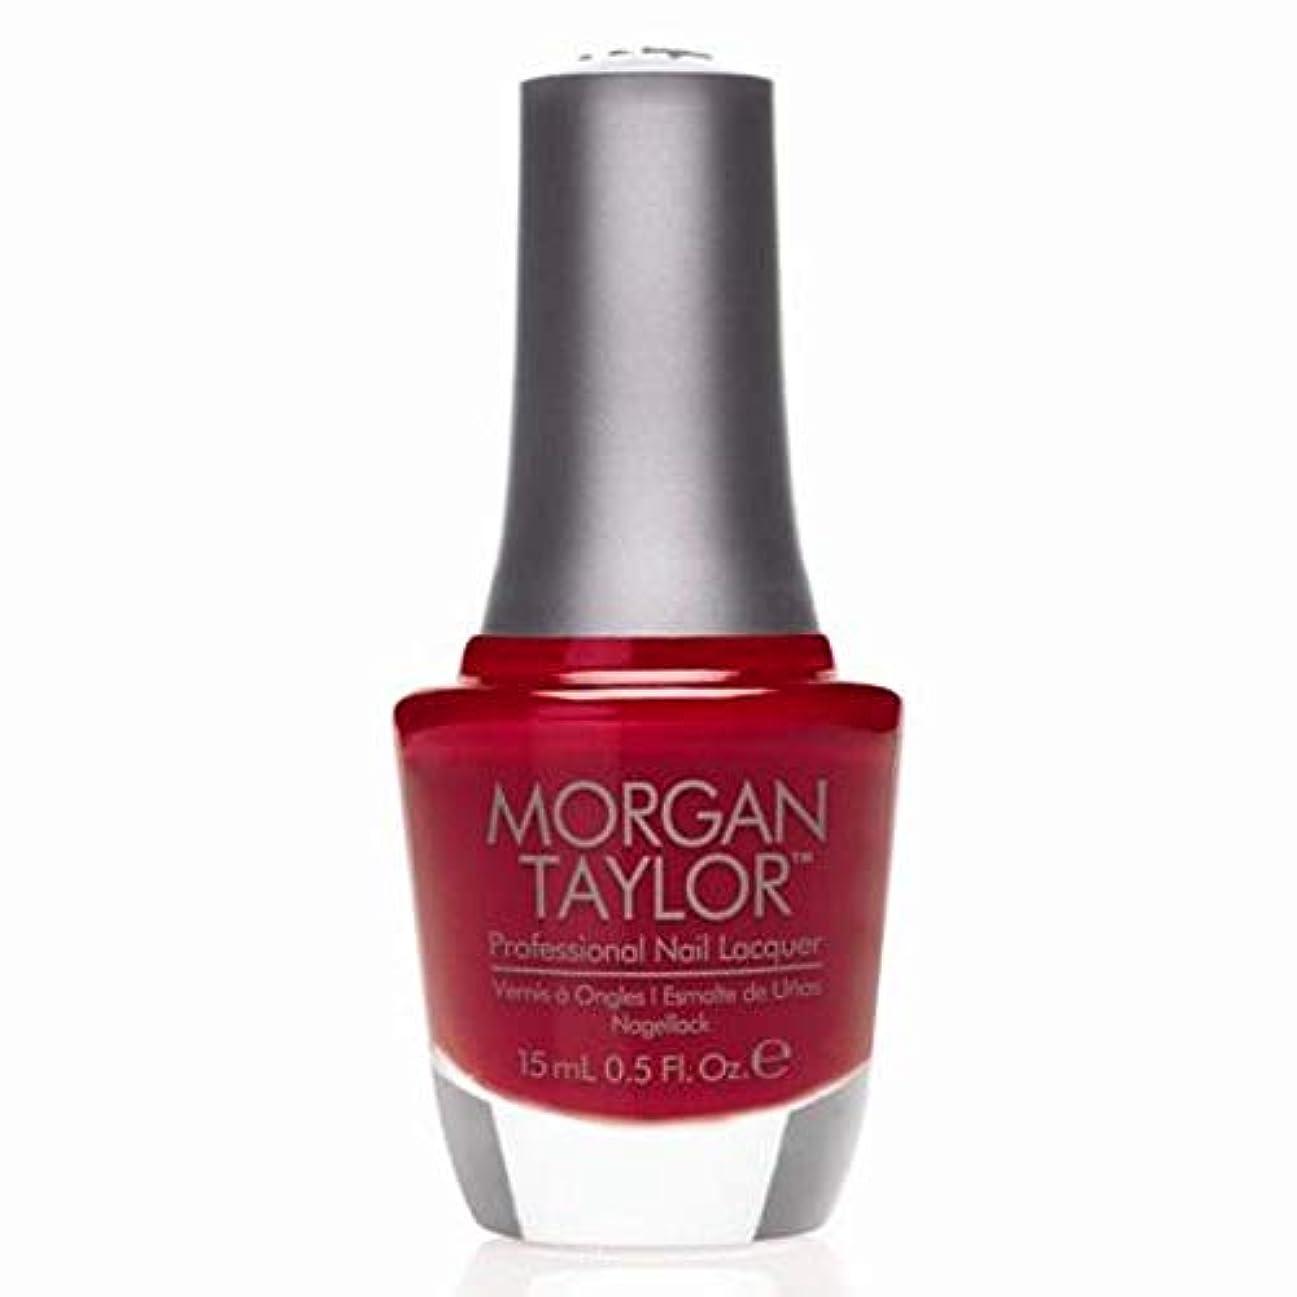 Morgan Taylor - Professional Nail Lacquer - Man of the Moment- 15 mL/0.5oz